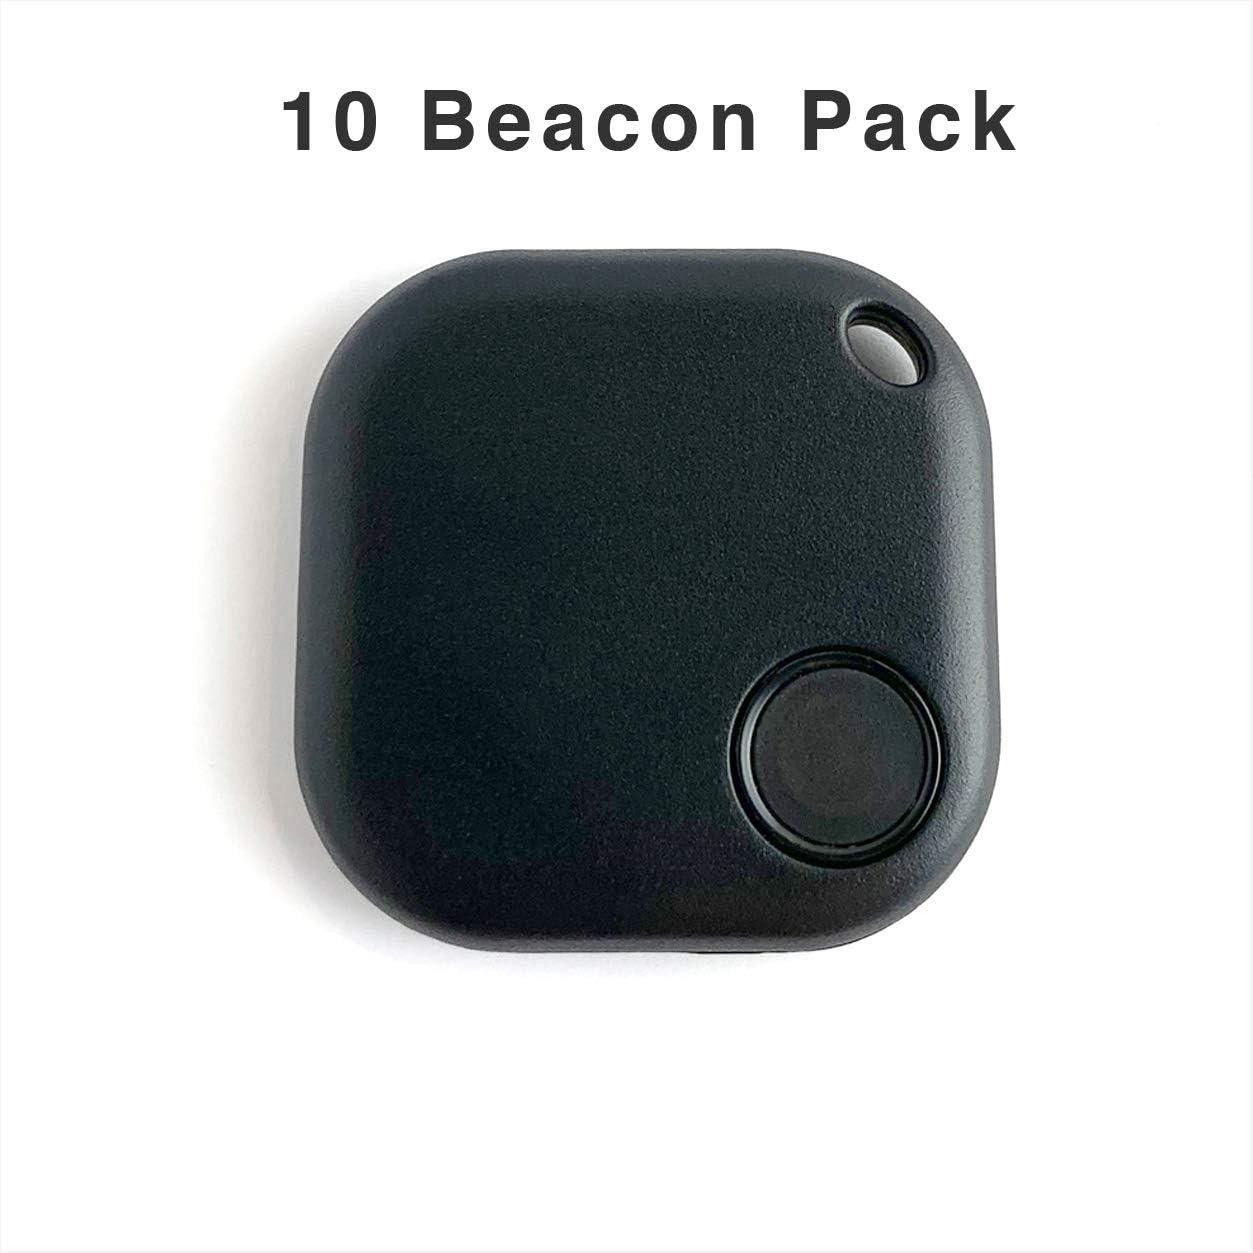 Blue Charm Beacons - Bluetooth BLE iBeacon (BC011-MultiBeacon) - Long Range BLE 5.0 - (Pack of 10)